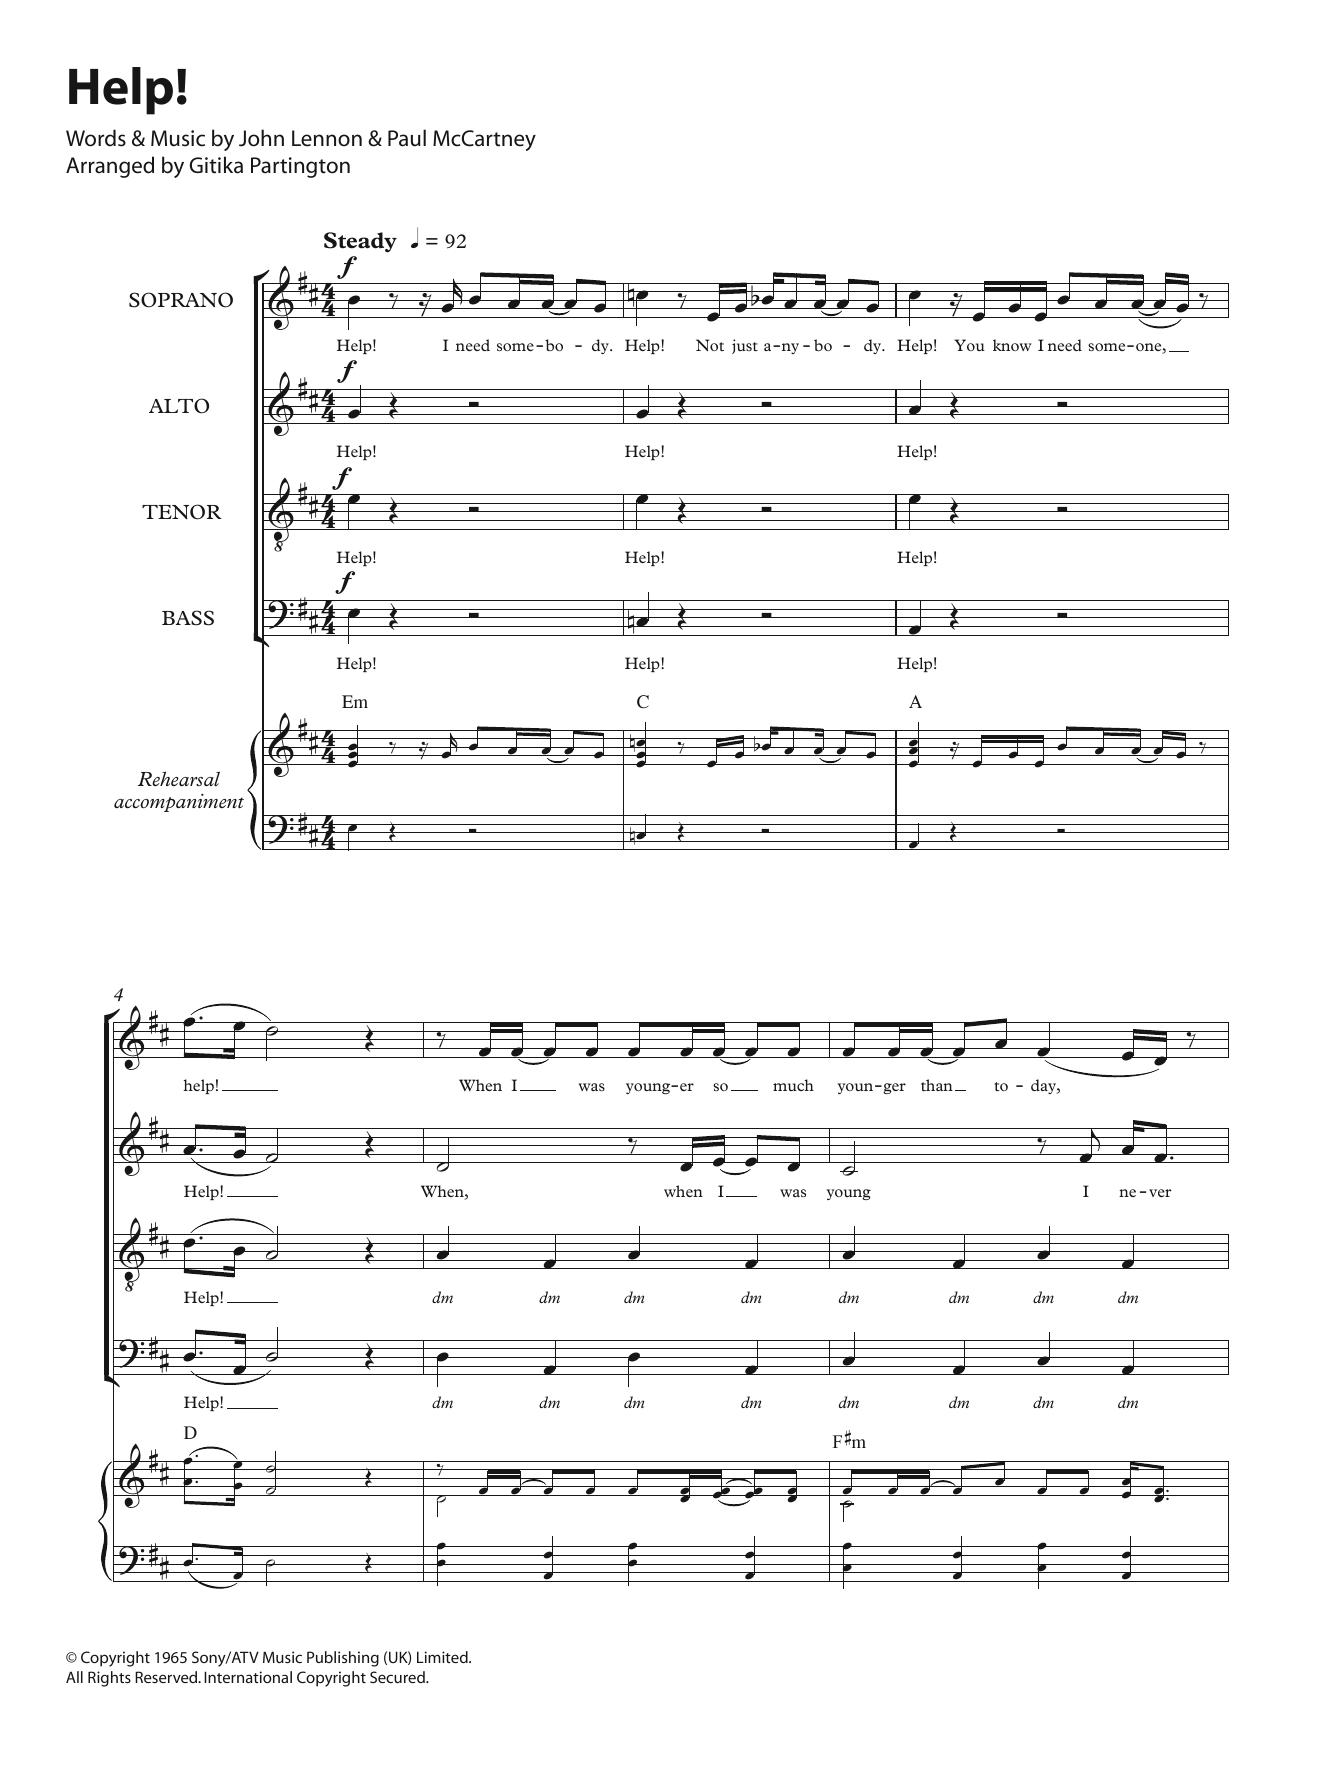 Sheet music digital files to print licensed john lennon digital arr gitika partington hexwebz Image collections